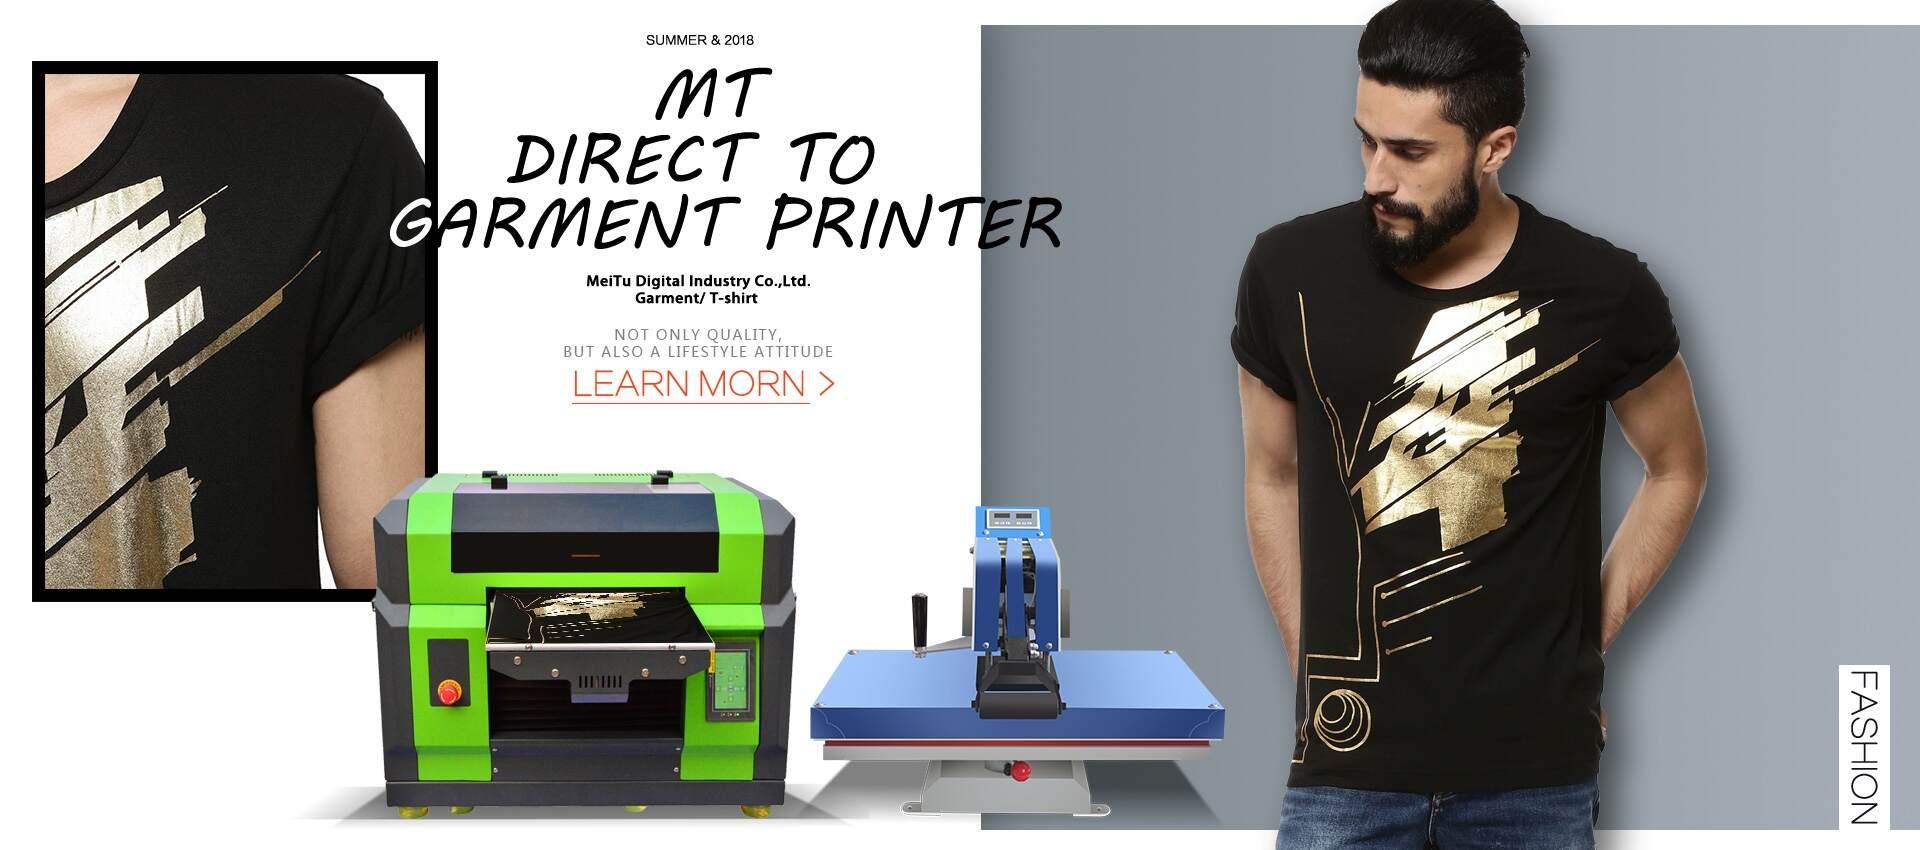 d0c65882 Digital Direct To Garment Printers | DTG Printers | Digital Apparel Printers  - Supplier & Manufacturer - www.MTuTech.com